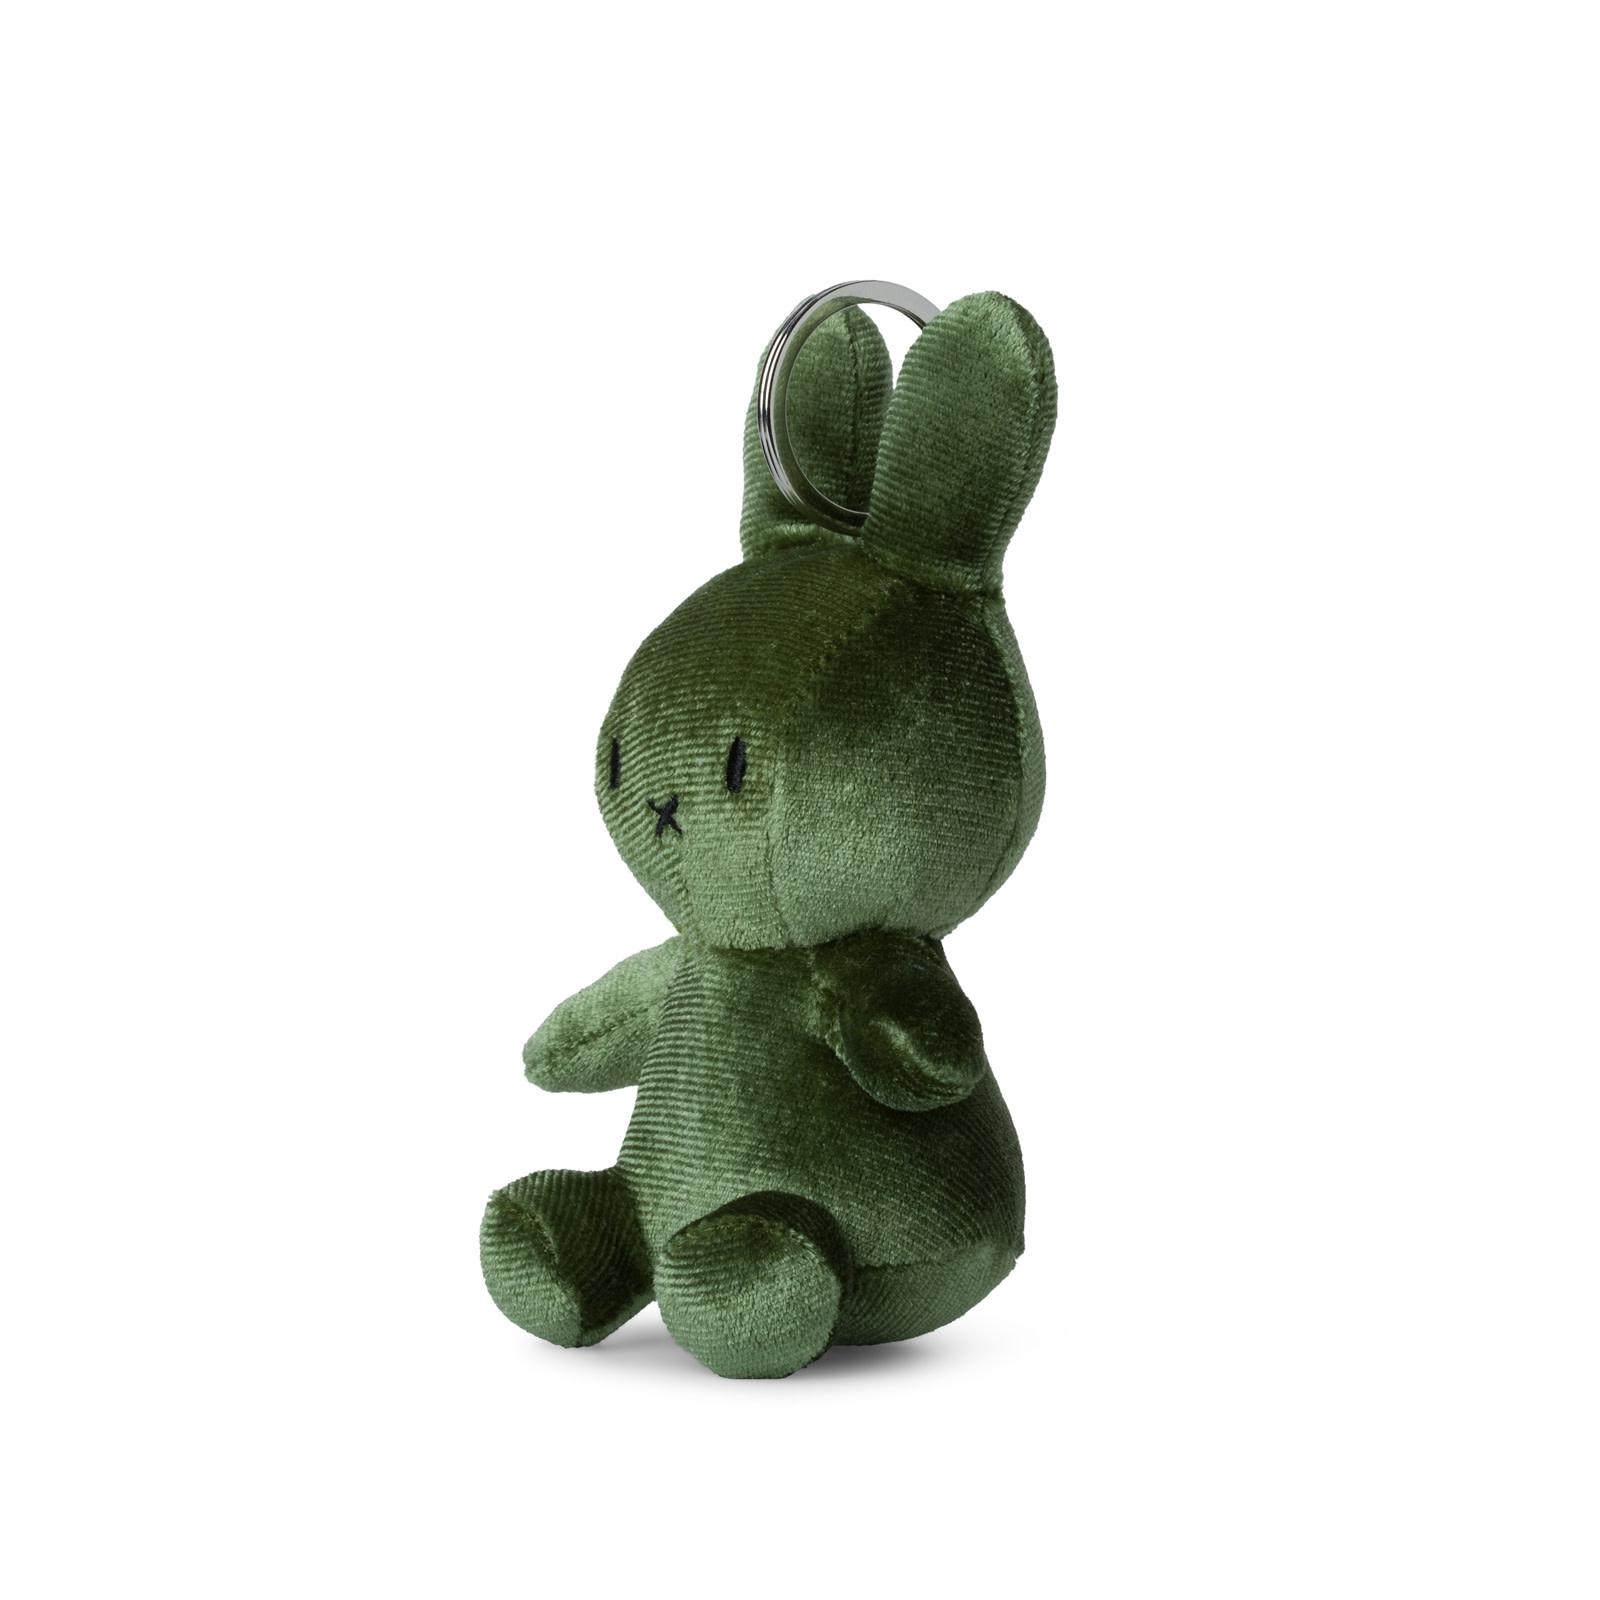 Nijntje/Miffy/Snuffy Miffy Keychain Velvet Moss Green 10cm